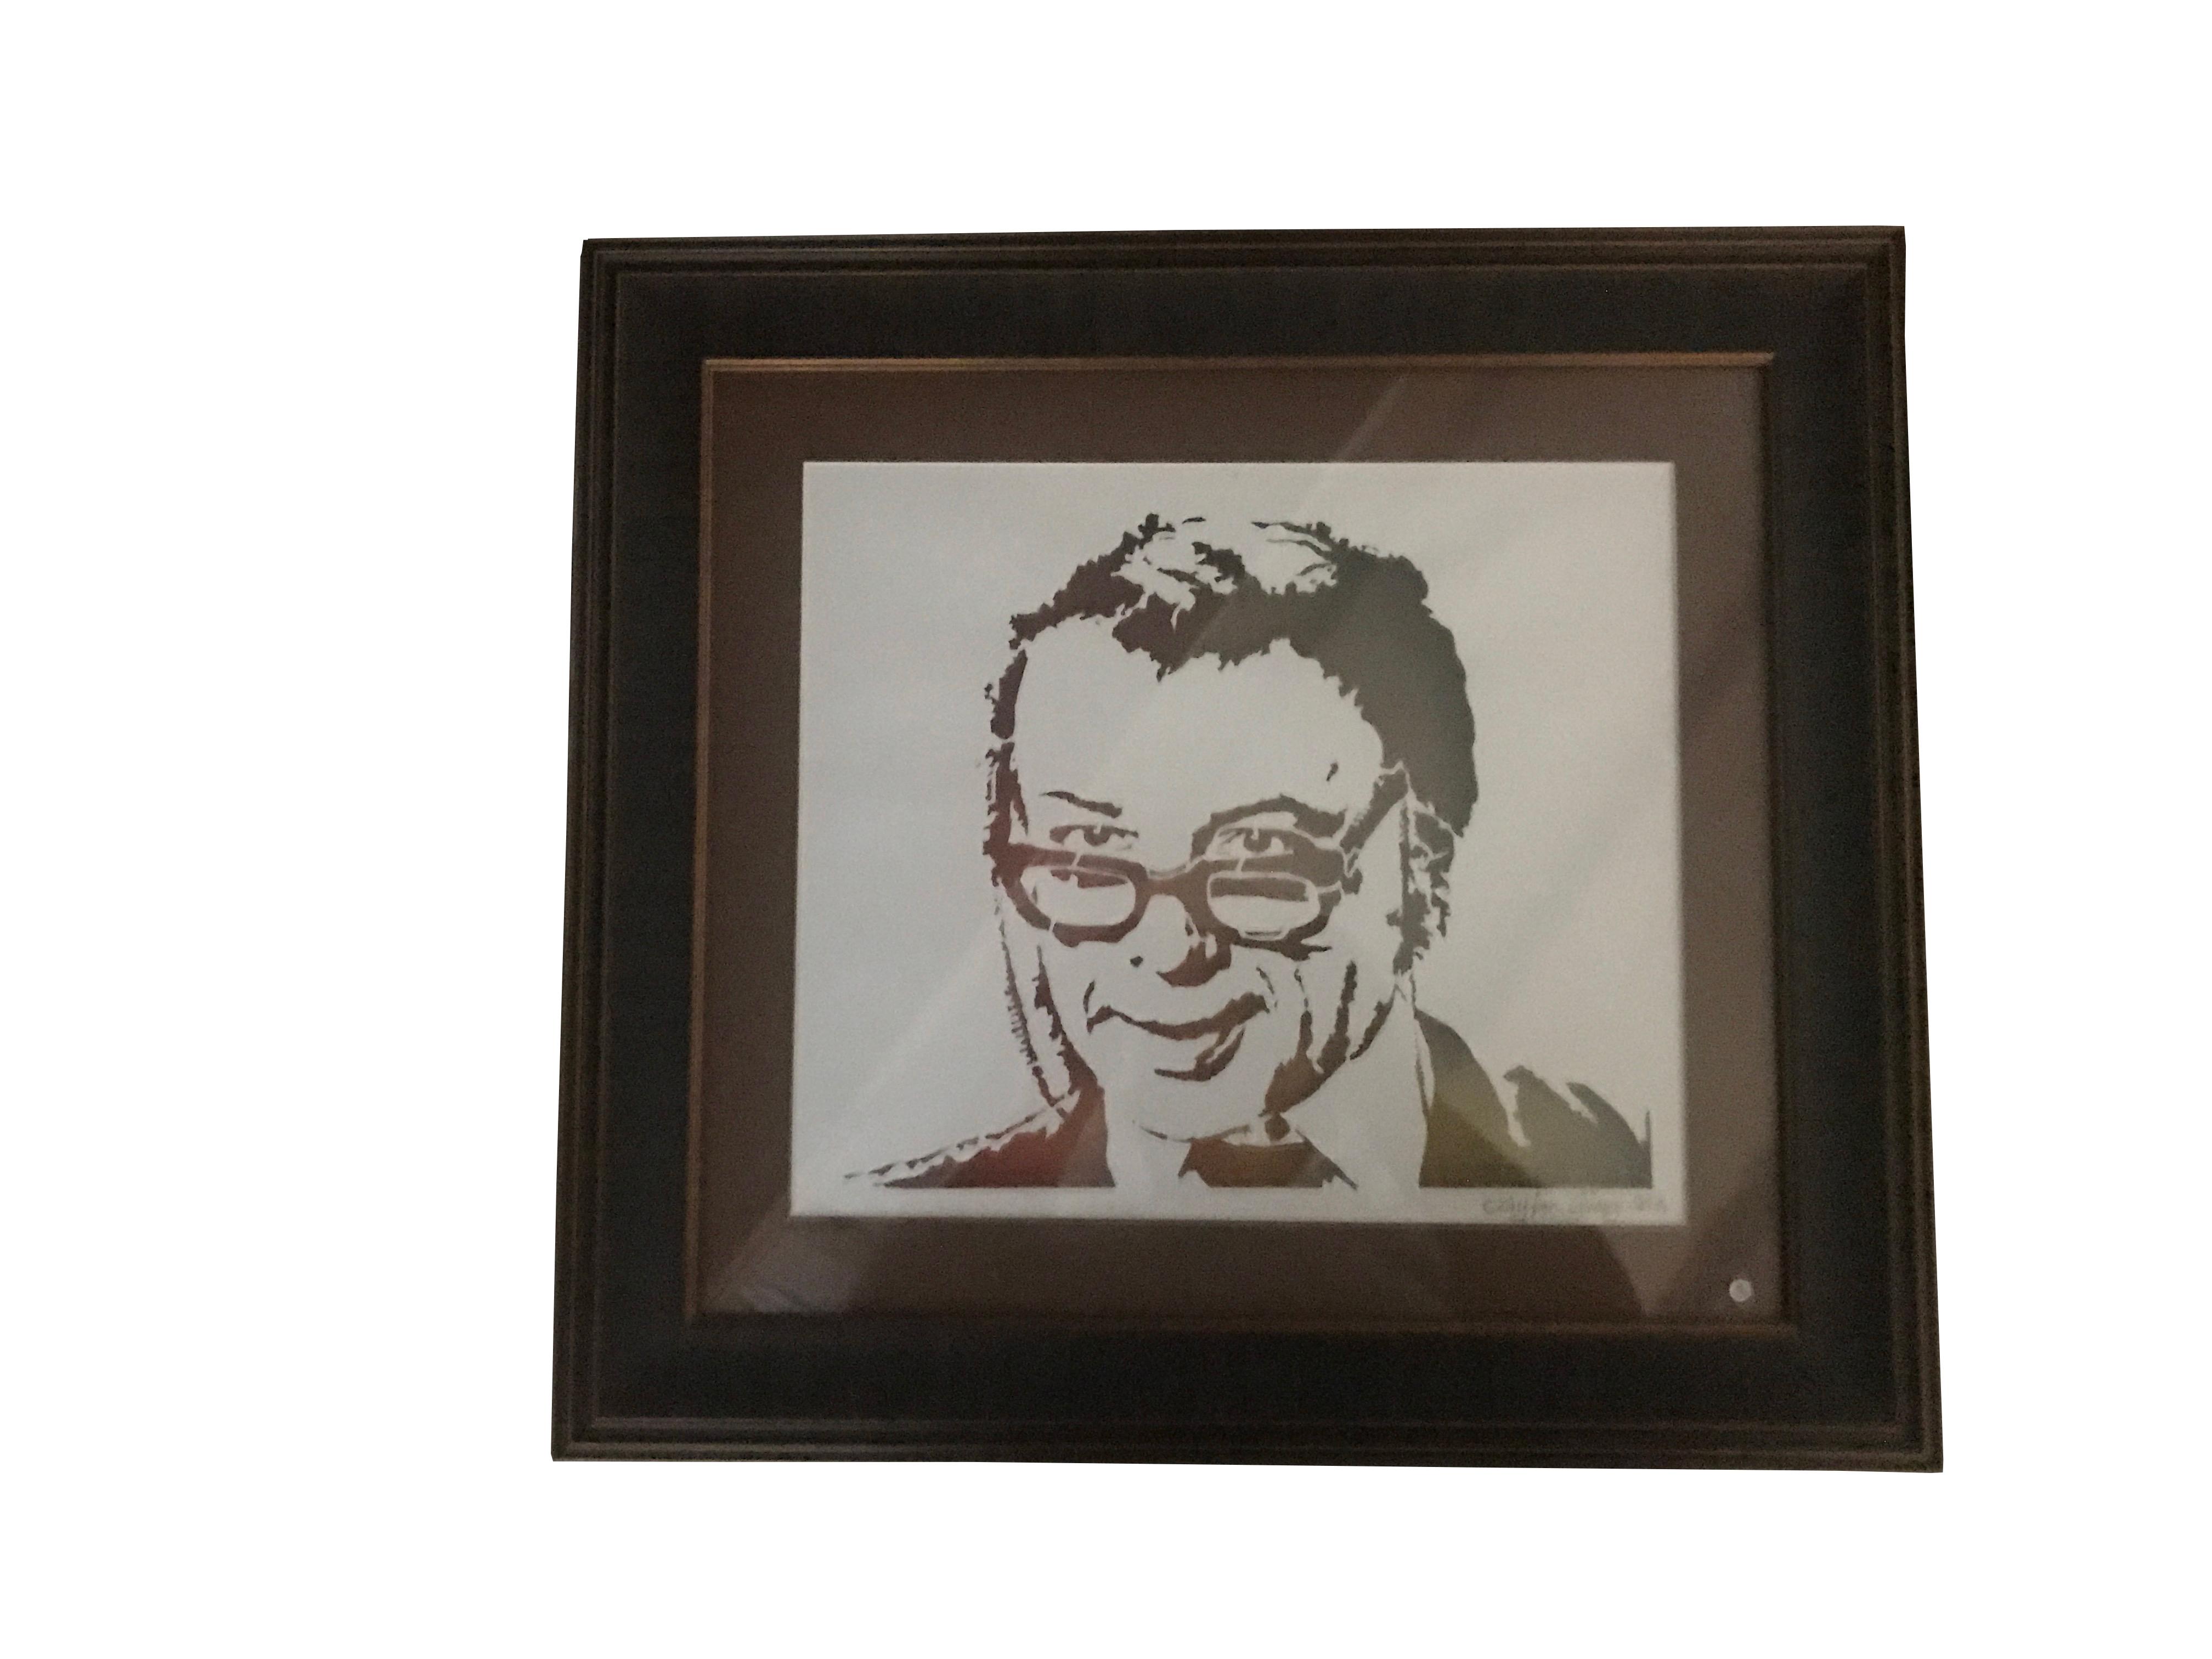 KATI' Sanatı Tablo Münir Özkul